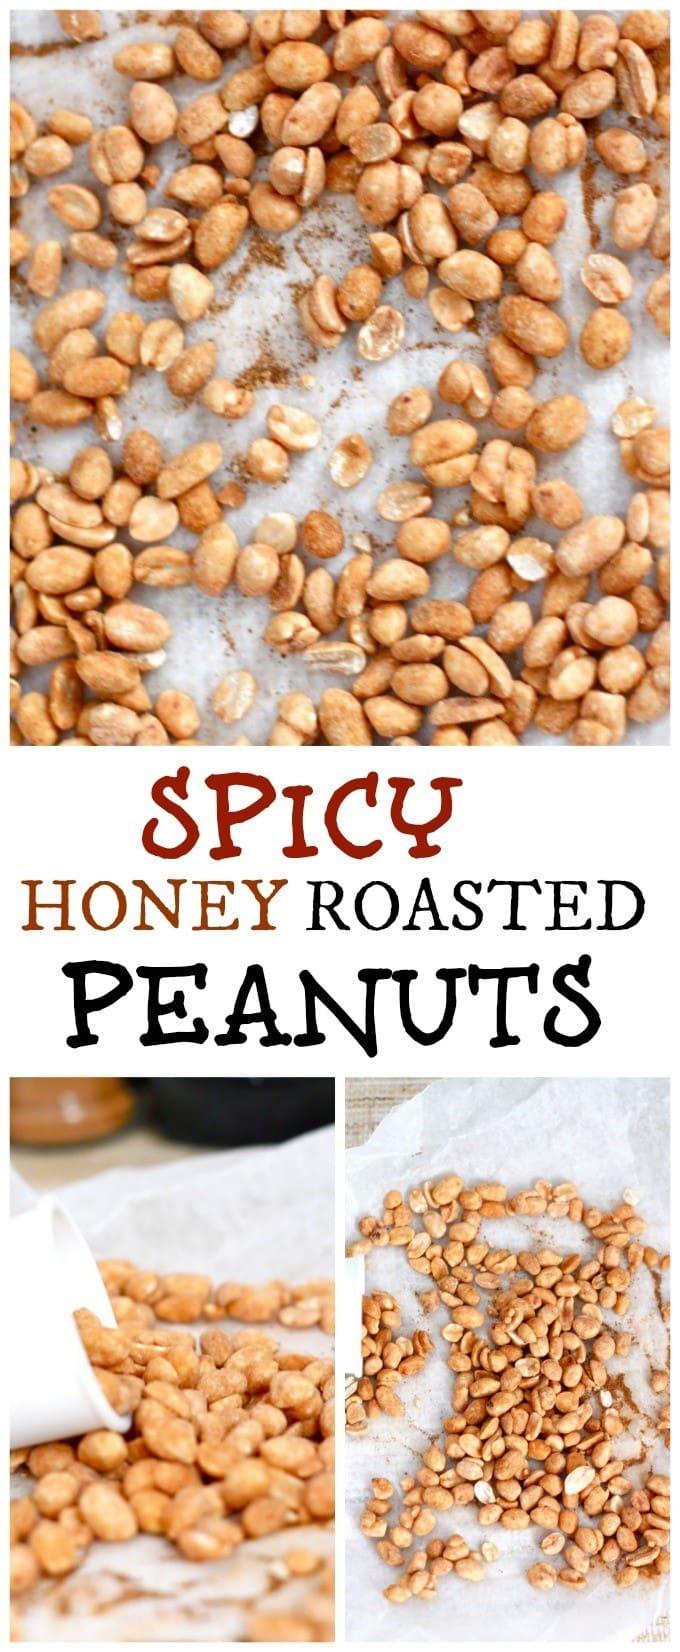 spicy_roasted_peanuts7